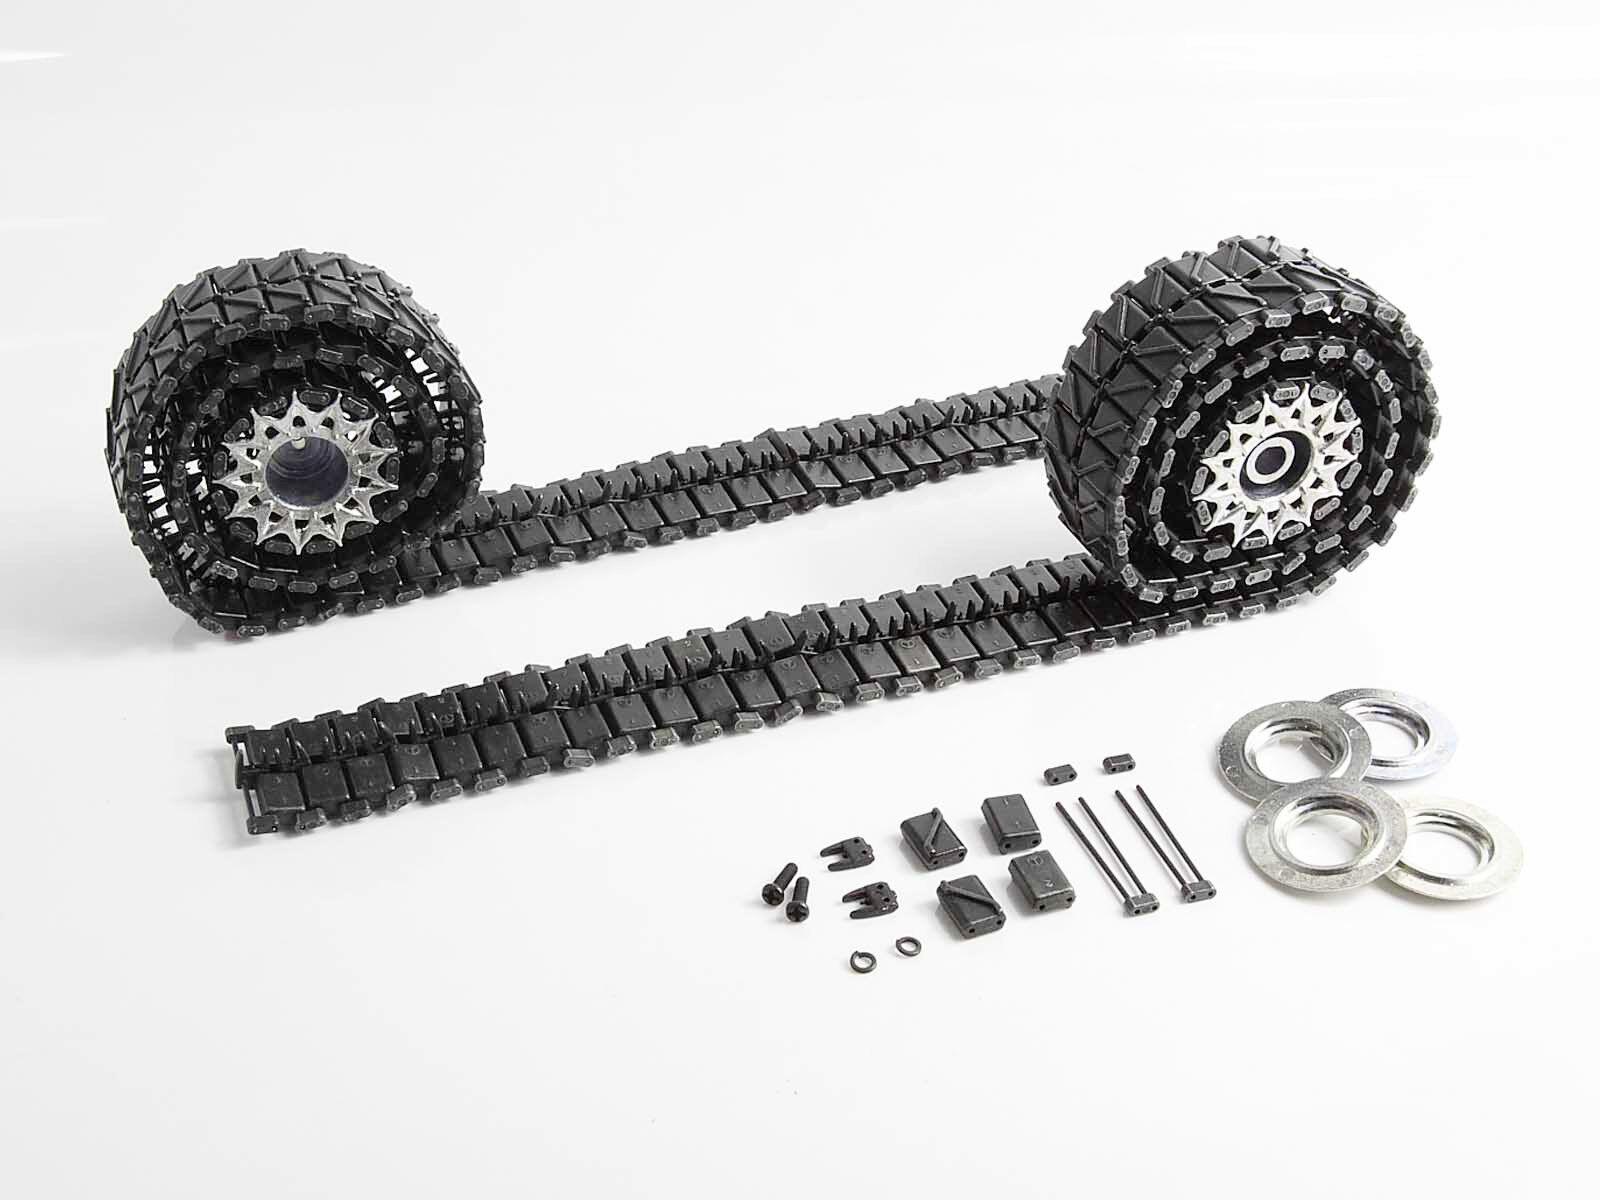 Mato MT002 1 16 Radio Control Tanque nos M26 Pershing pistas de metal ruedas dentadas las ruedas motrices